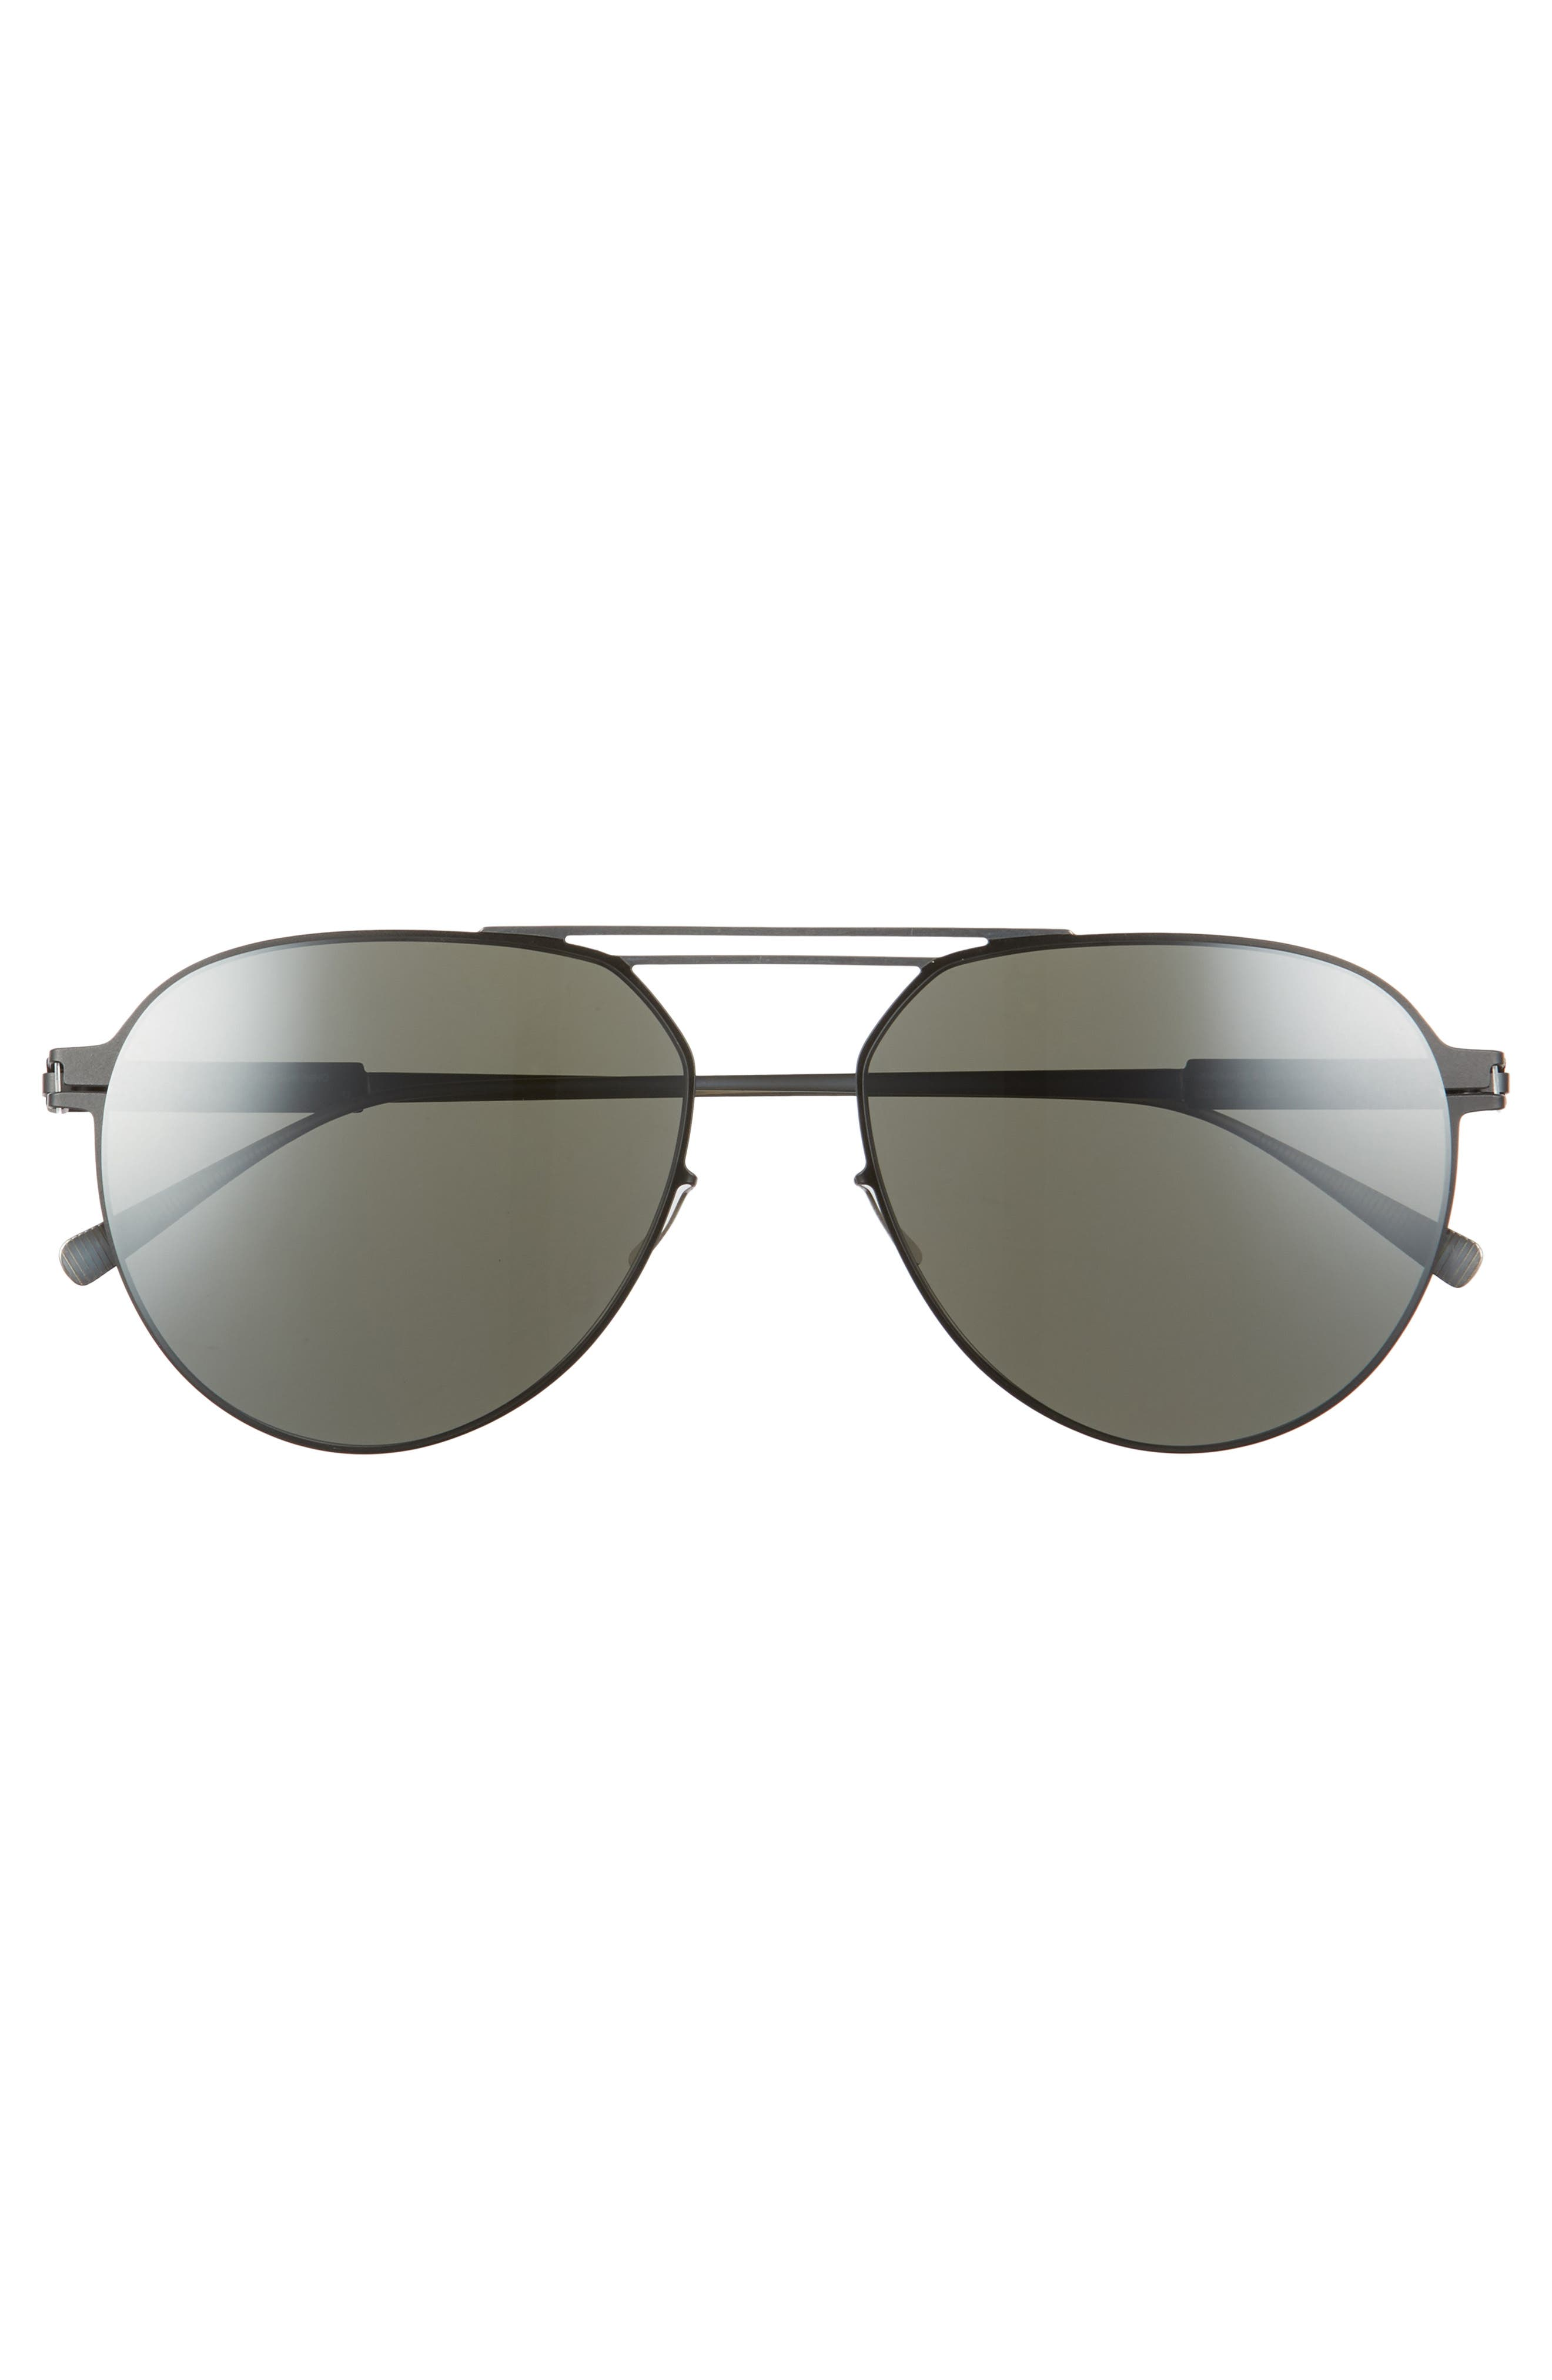 Nino 57mm Aviator Sunglasses,                             Alternate thumbnail 2, color,                             042